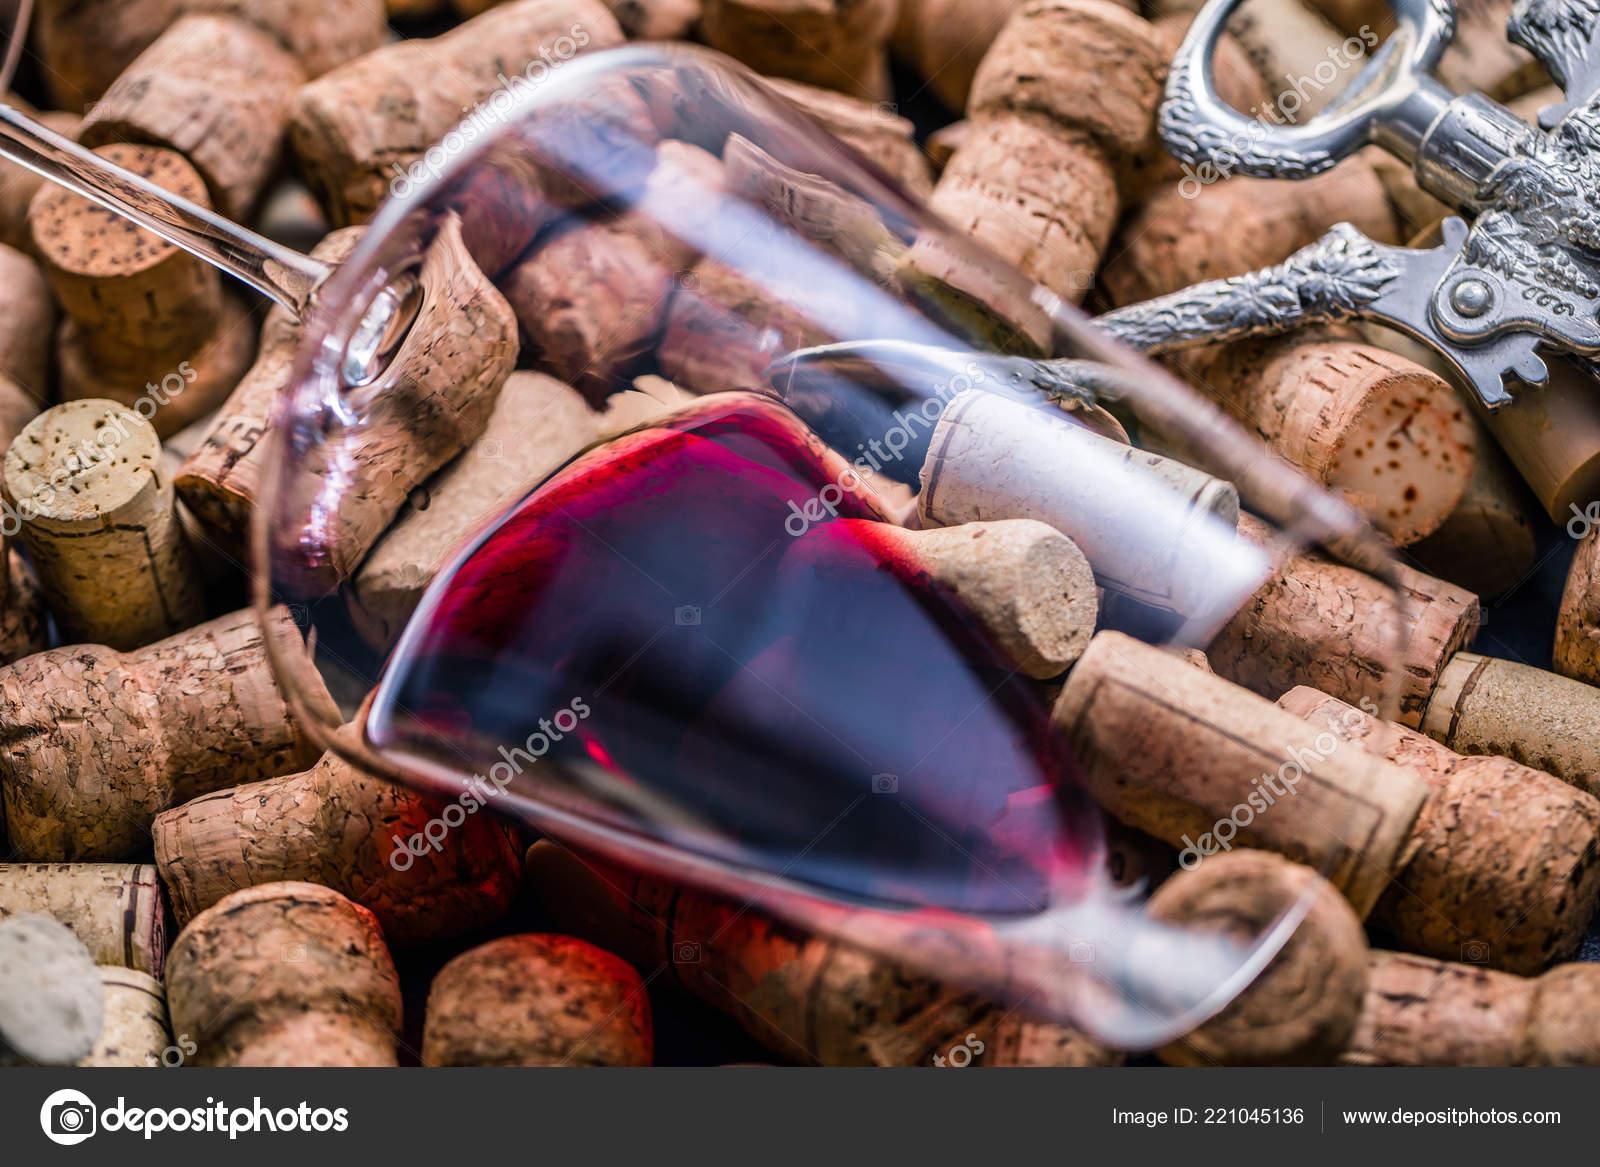 3ee1badd7d1681 Wine Corks Background Close — Stock Photo © KarepaStock  221045136